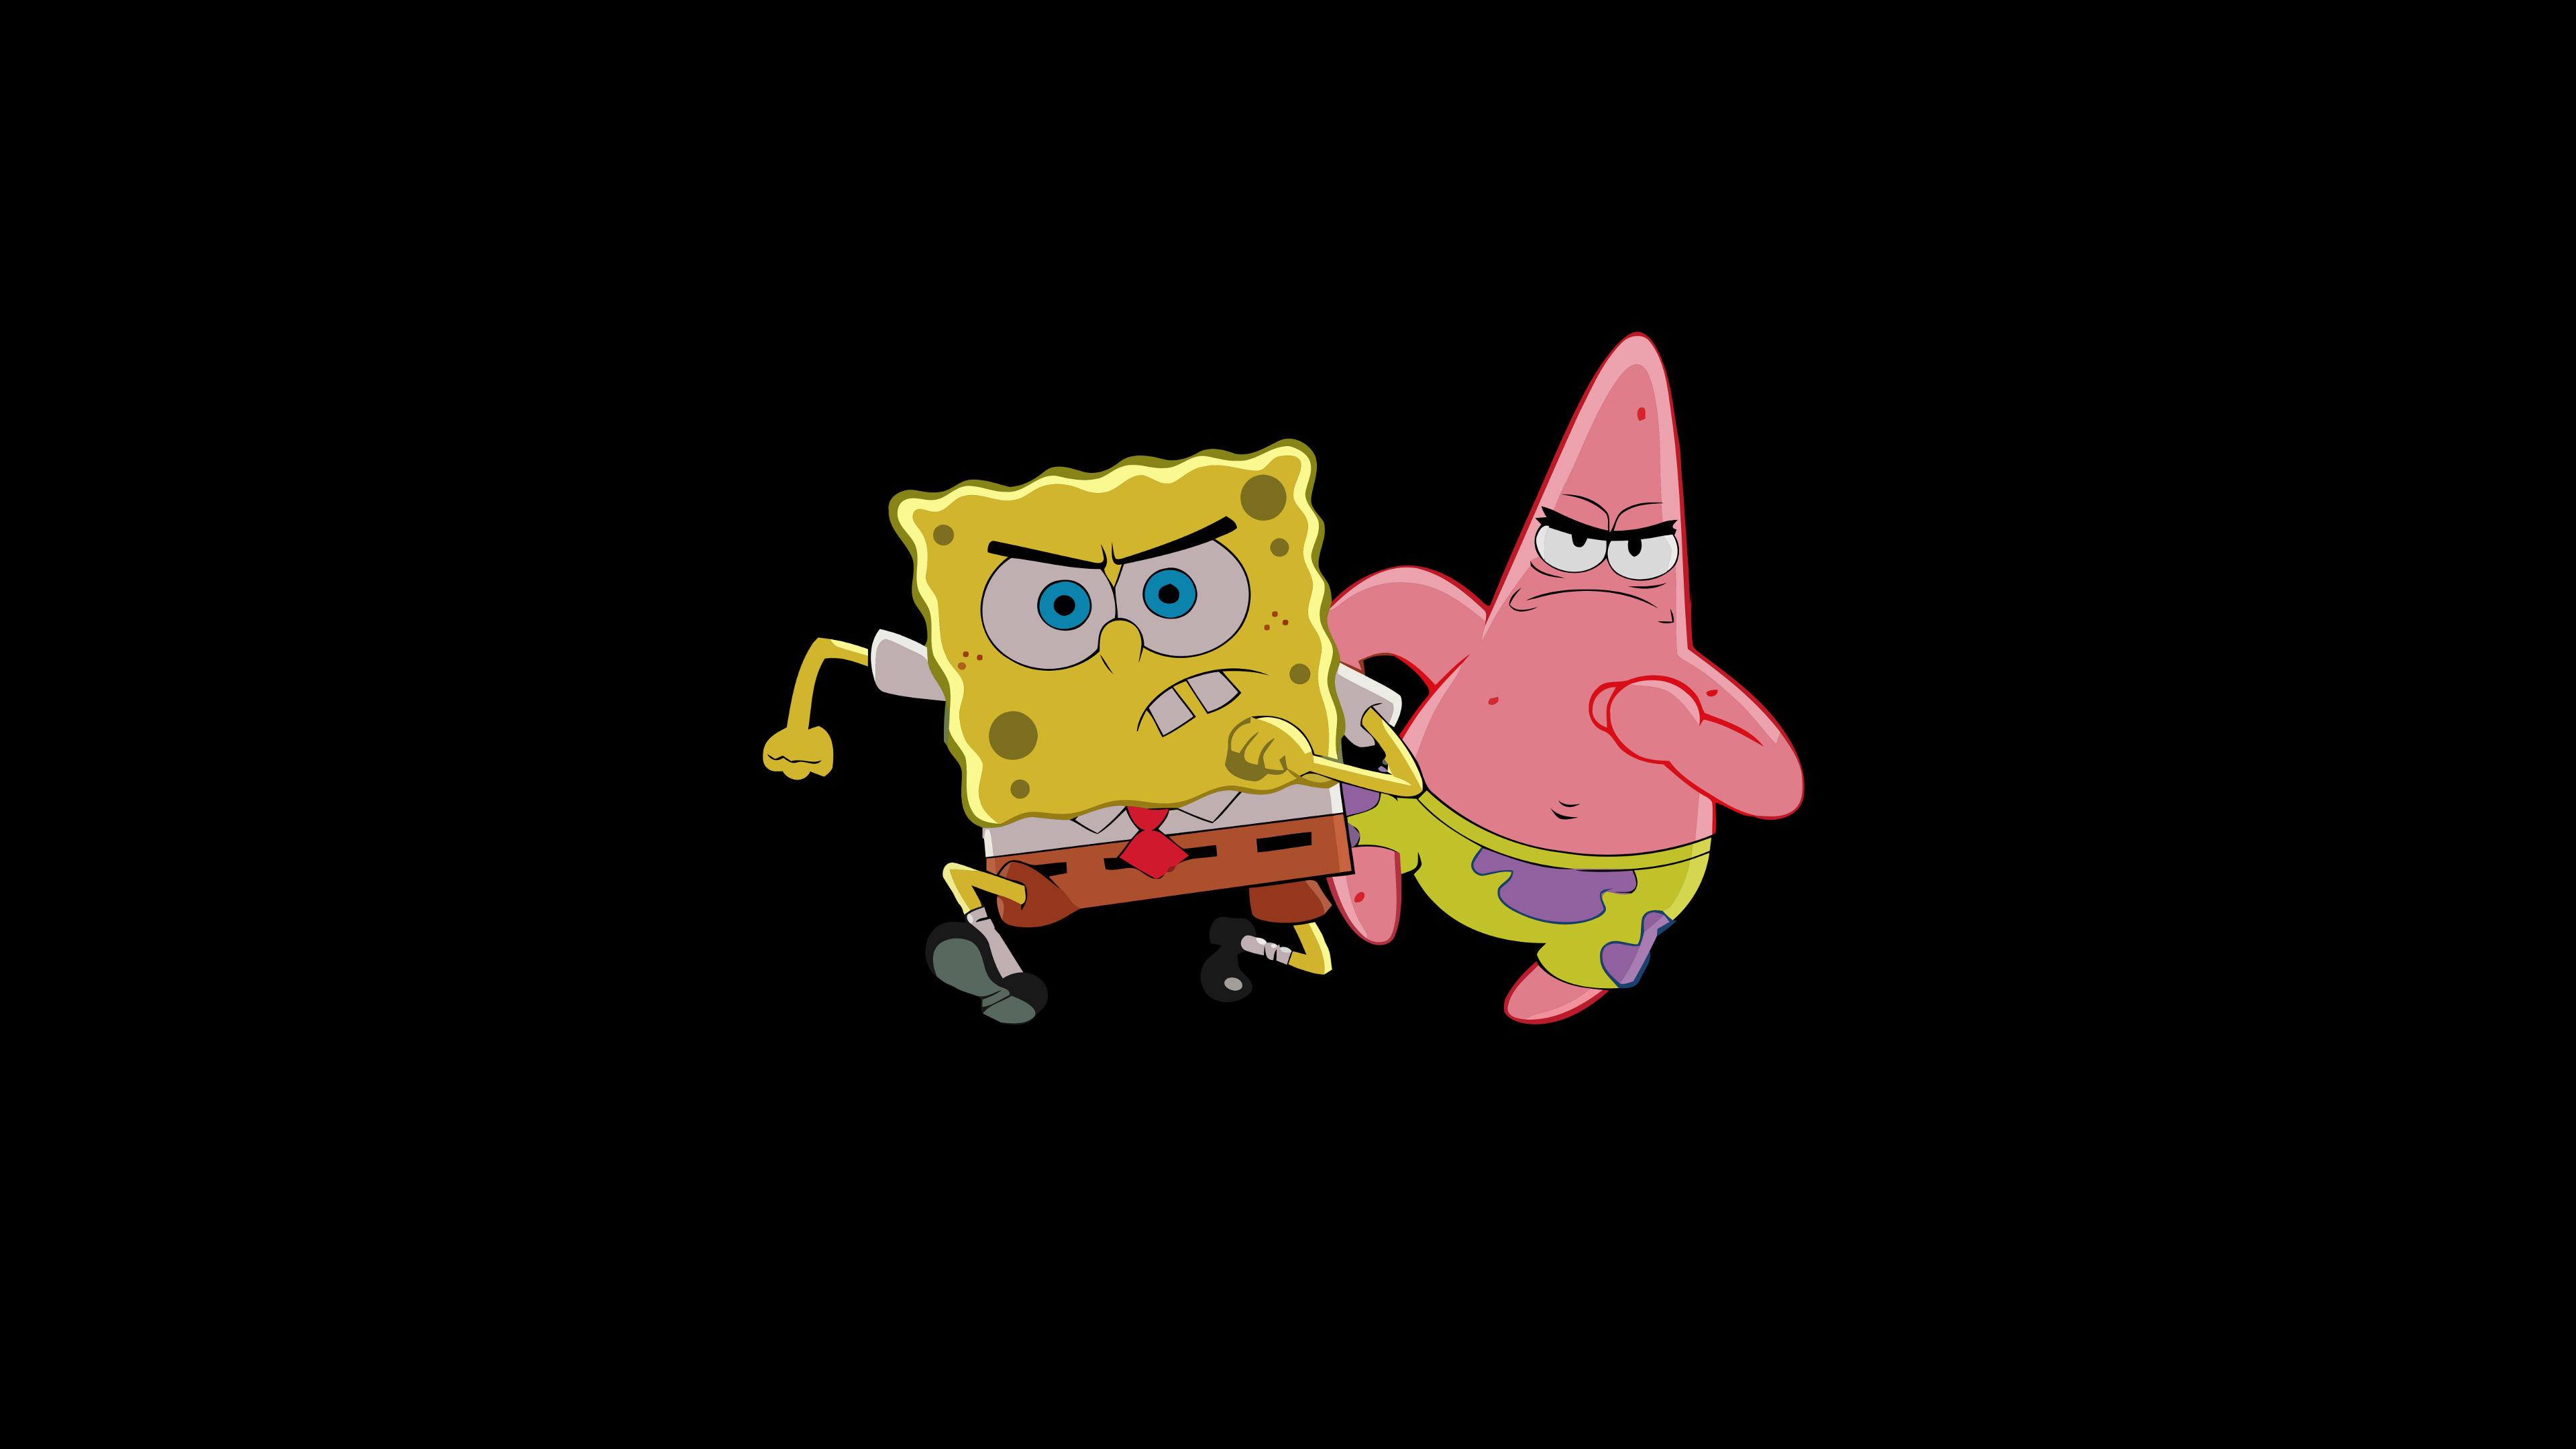 Patrick Star And Spongebob Hd Cartoons 4k Wallpapers Images